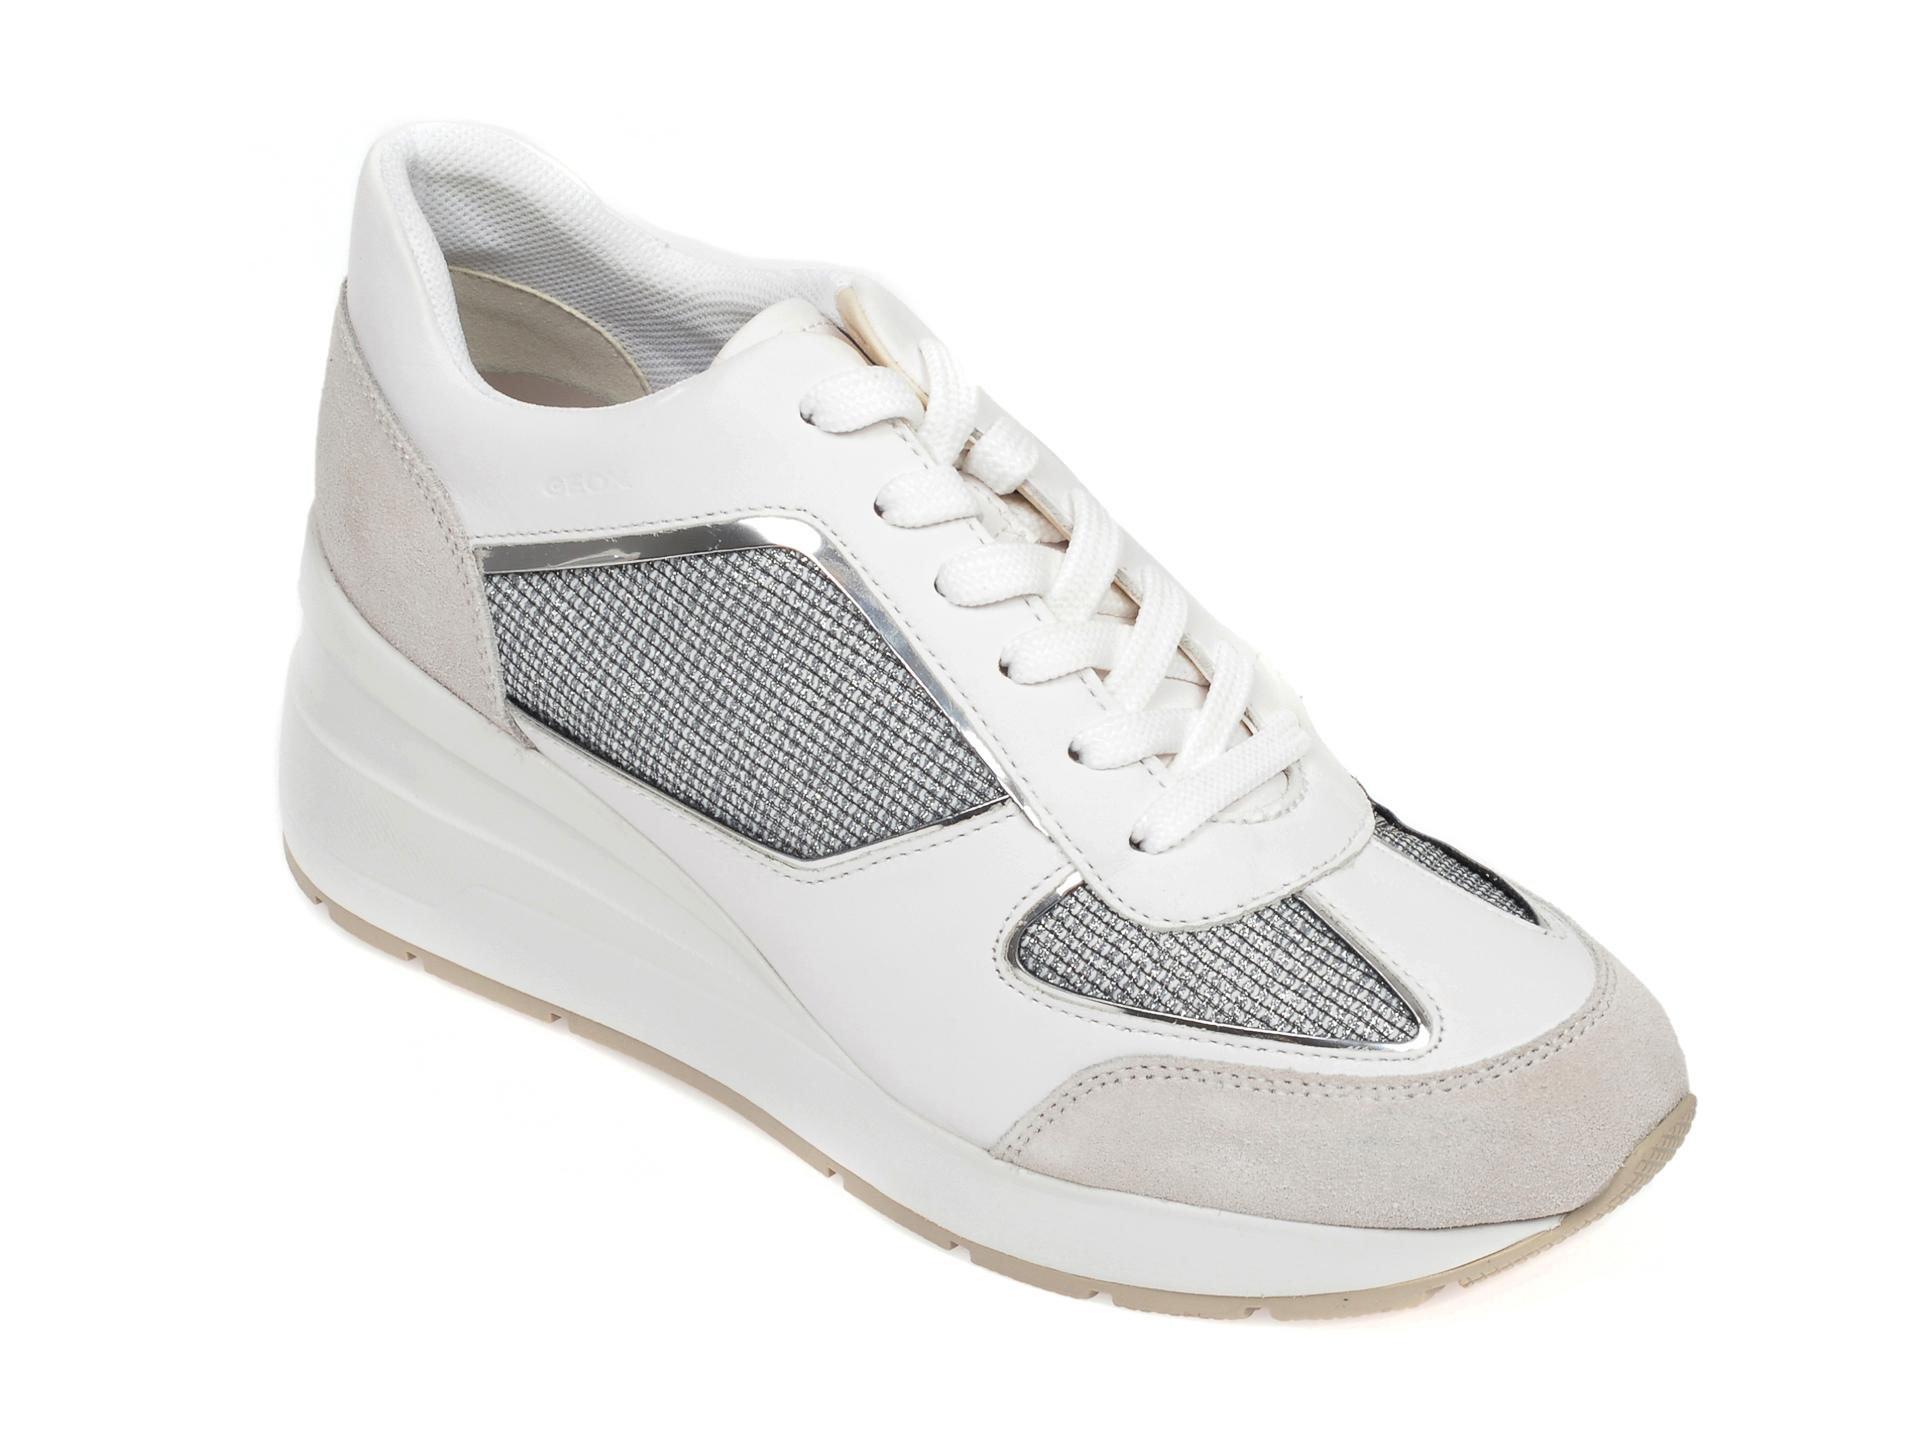 Pantofi sport GEOX albi, D028LA, din material textil si piele intoarsa